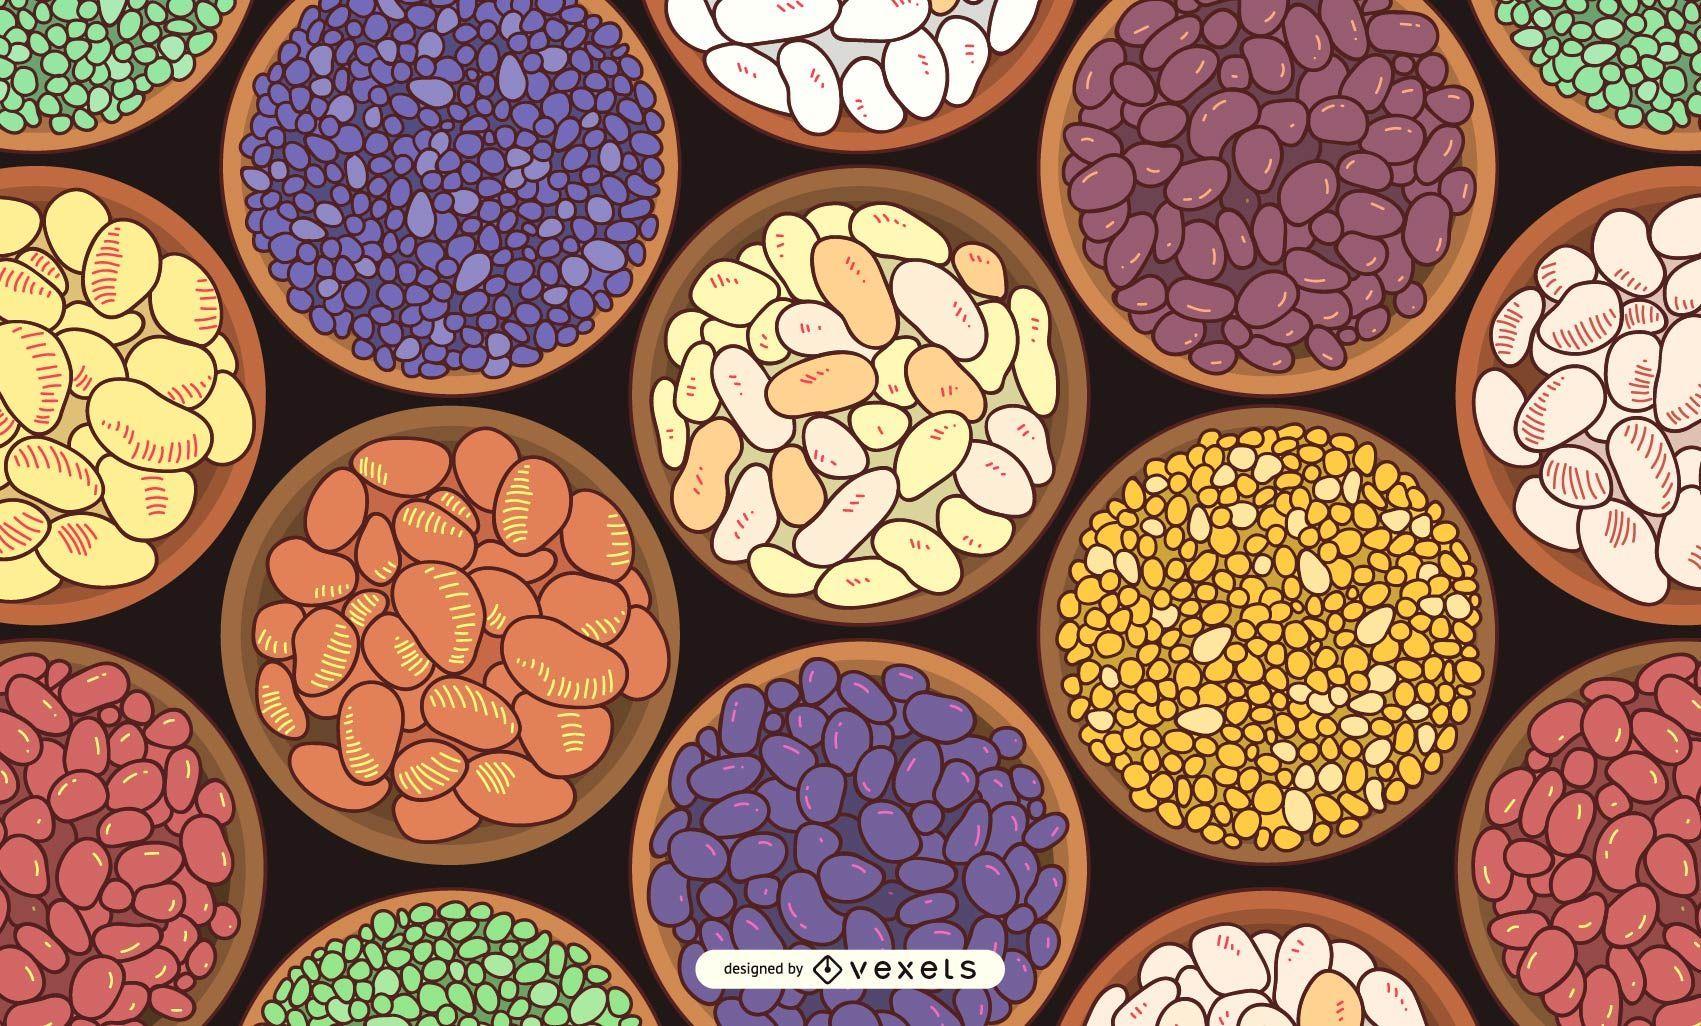 Bowls of beans illustration